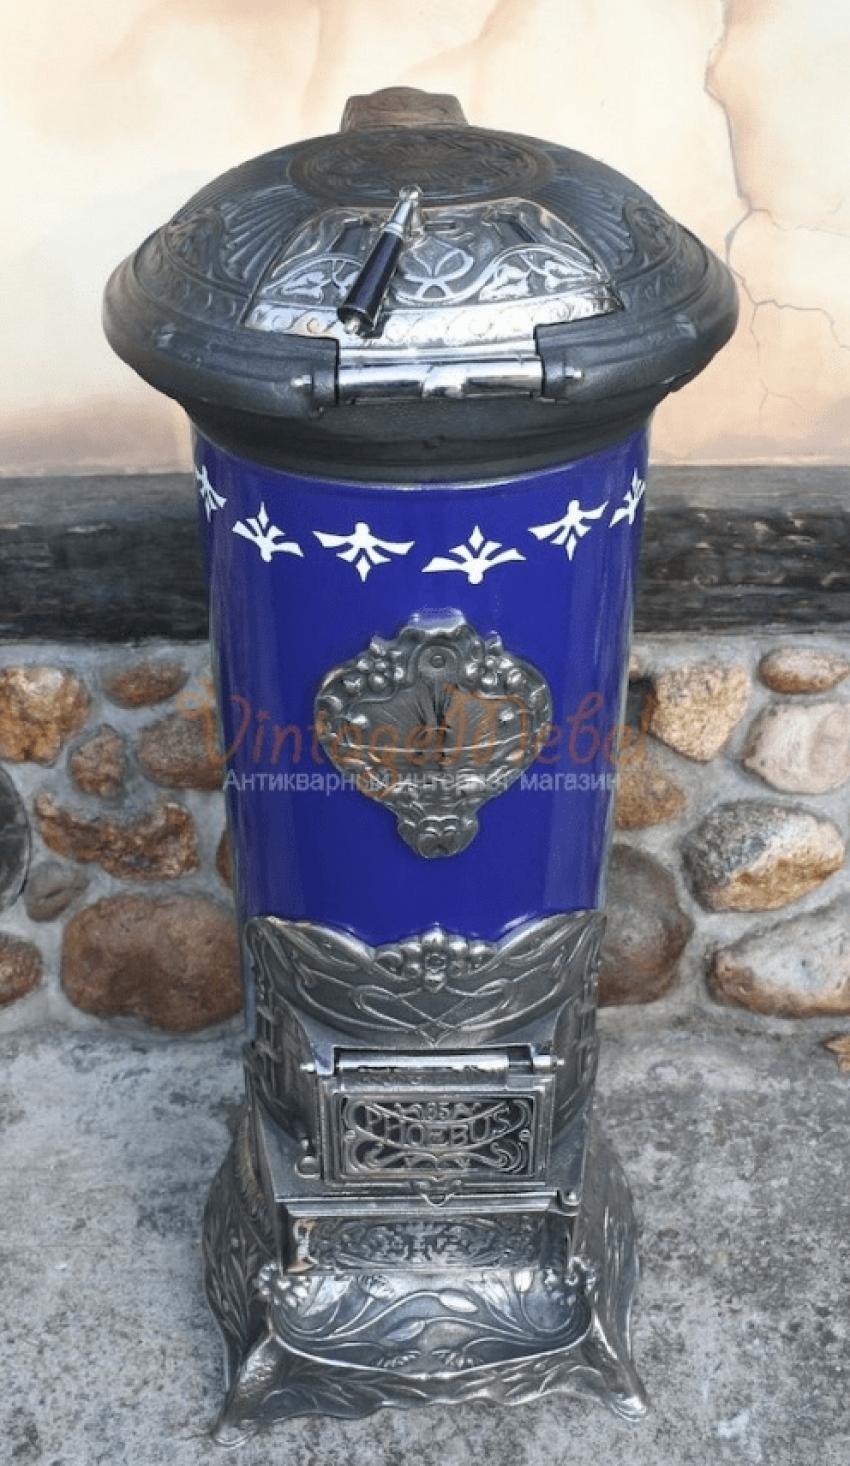 Antique stove cast iron - photo 4